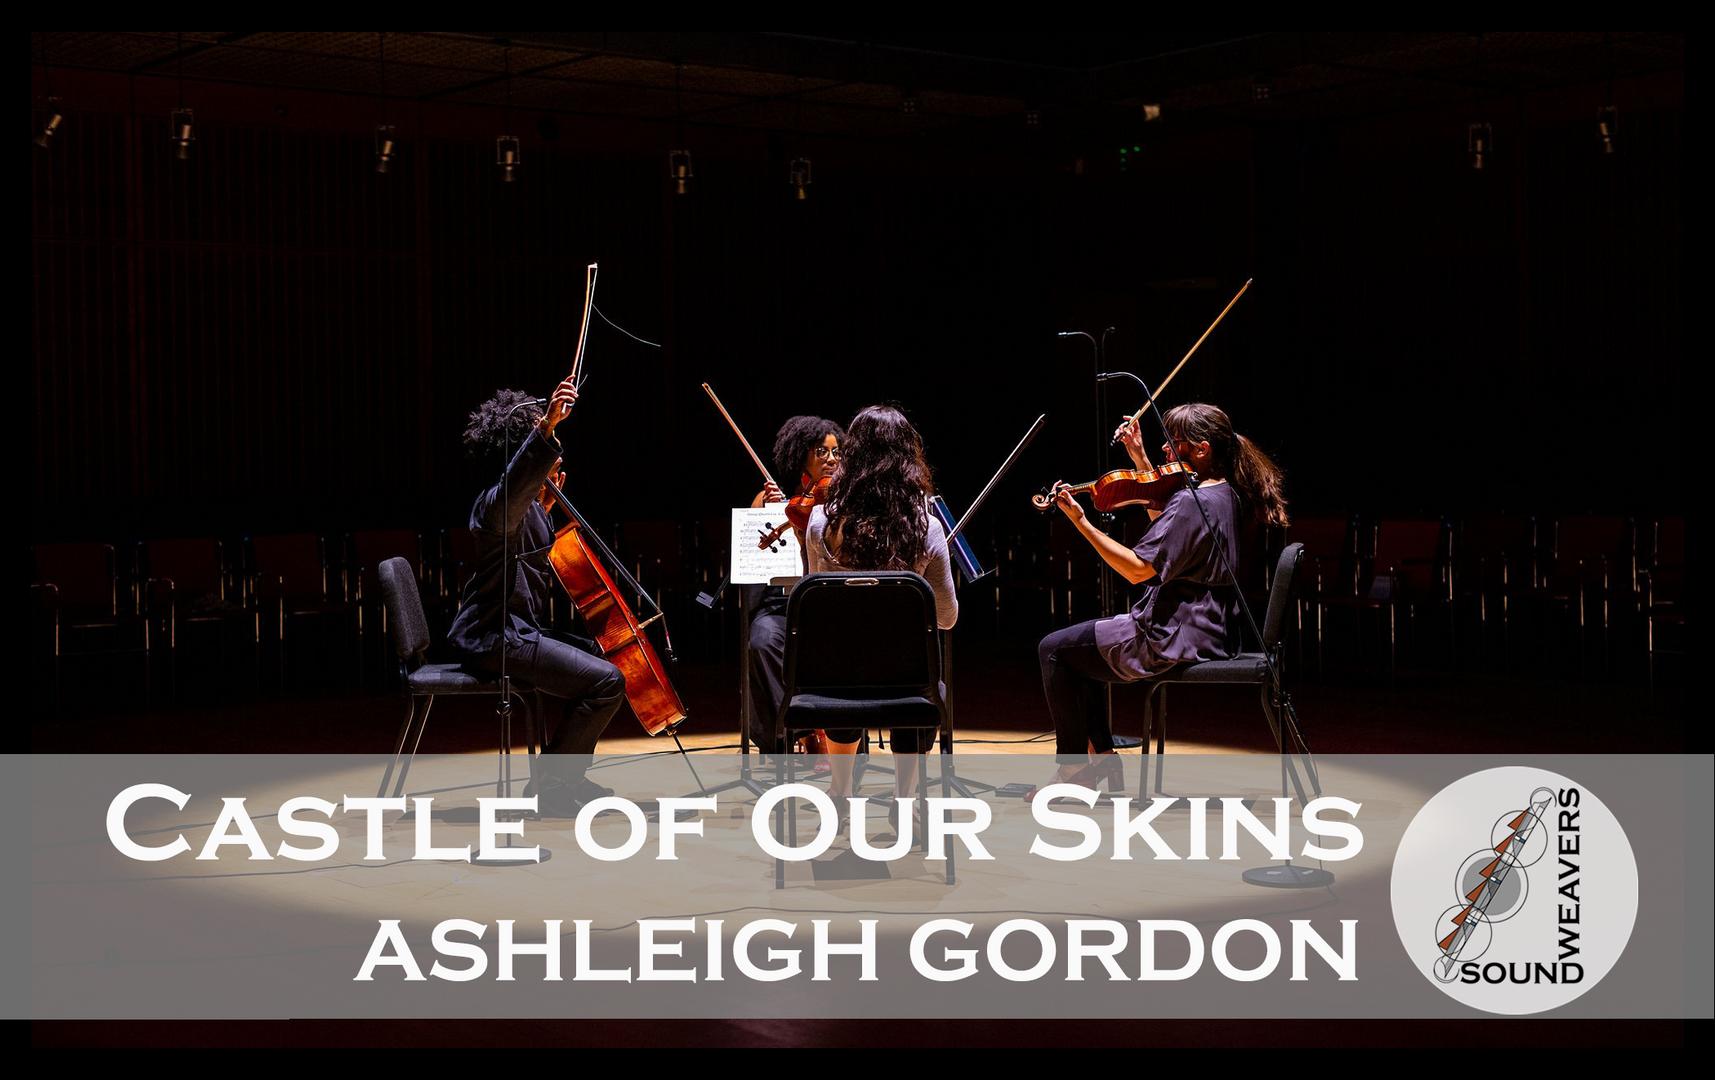 Castle Of Our Skins, Ashleigh Gordon, S1.E8